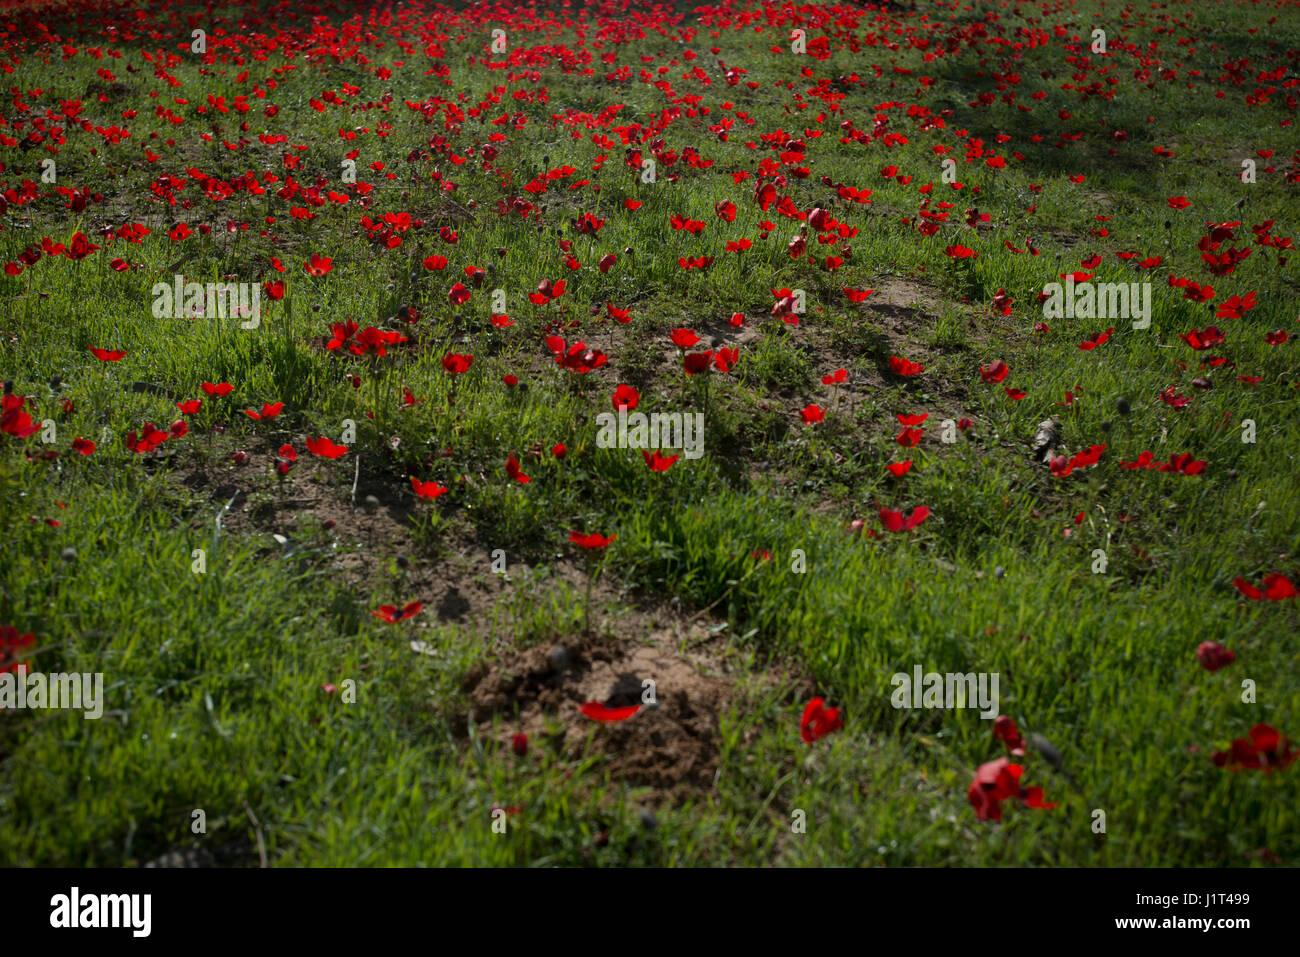 israel spring flower red poppy stockfotos israel spring. Black Bedroom Furniture Sets. Home Design Ideas